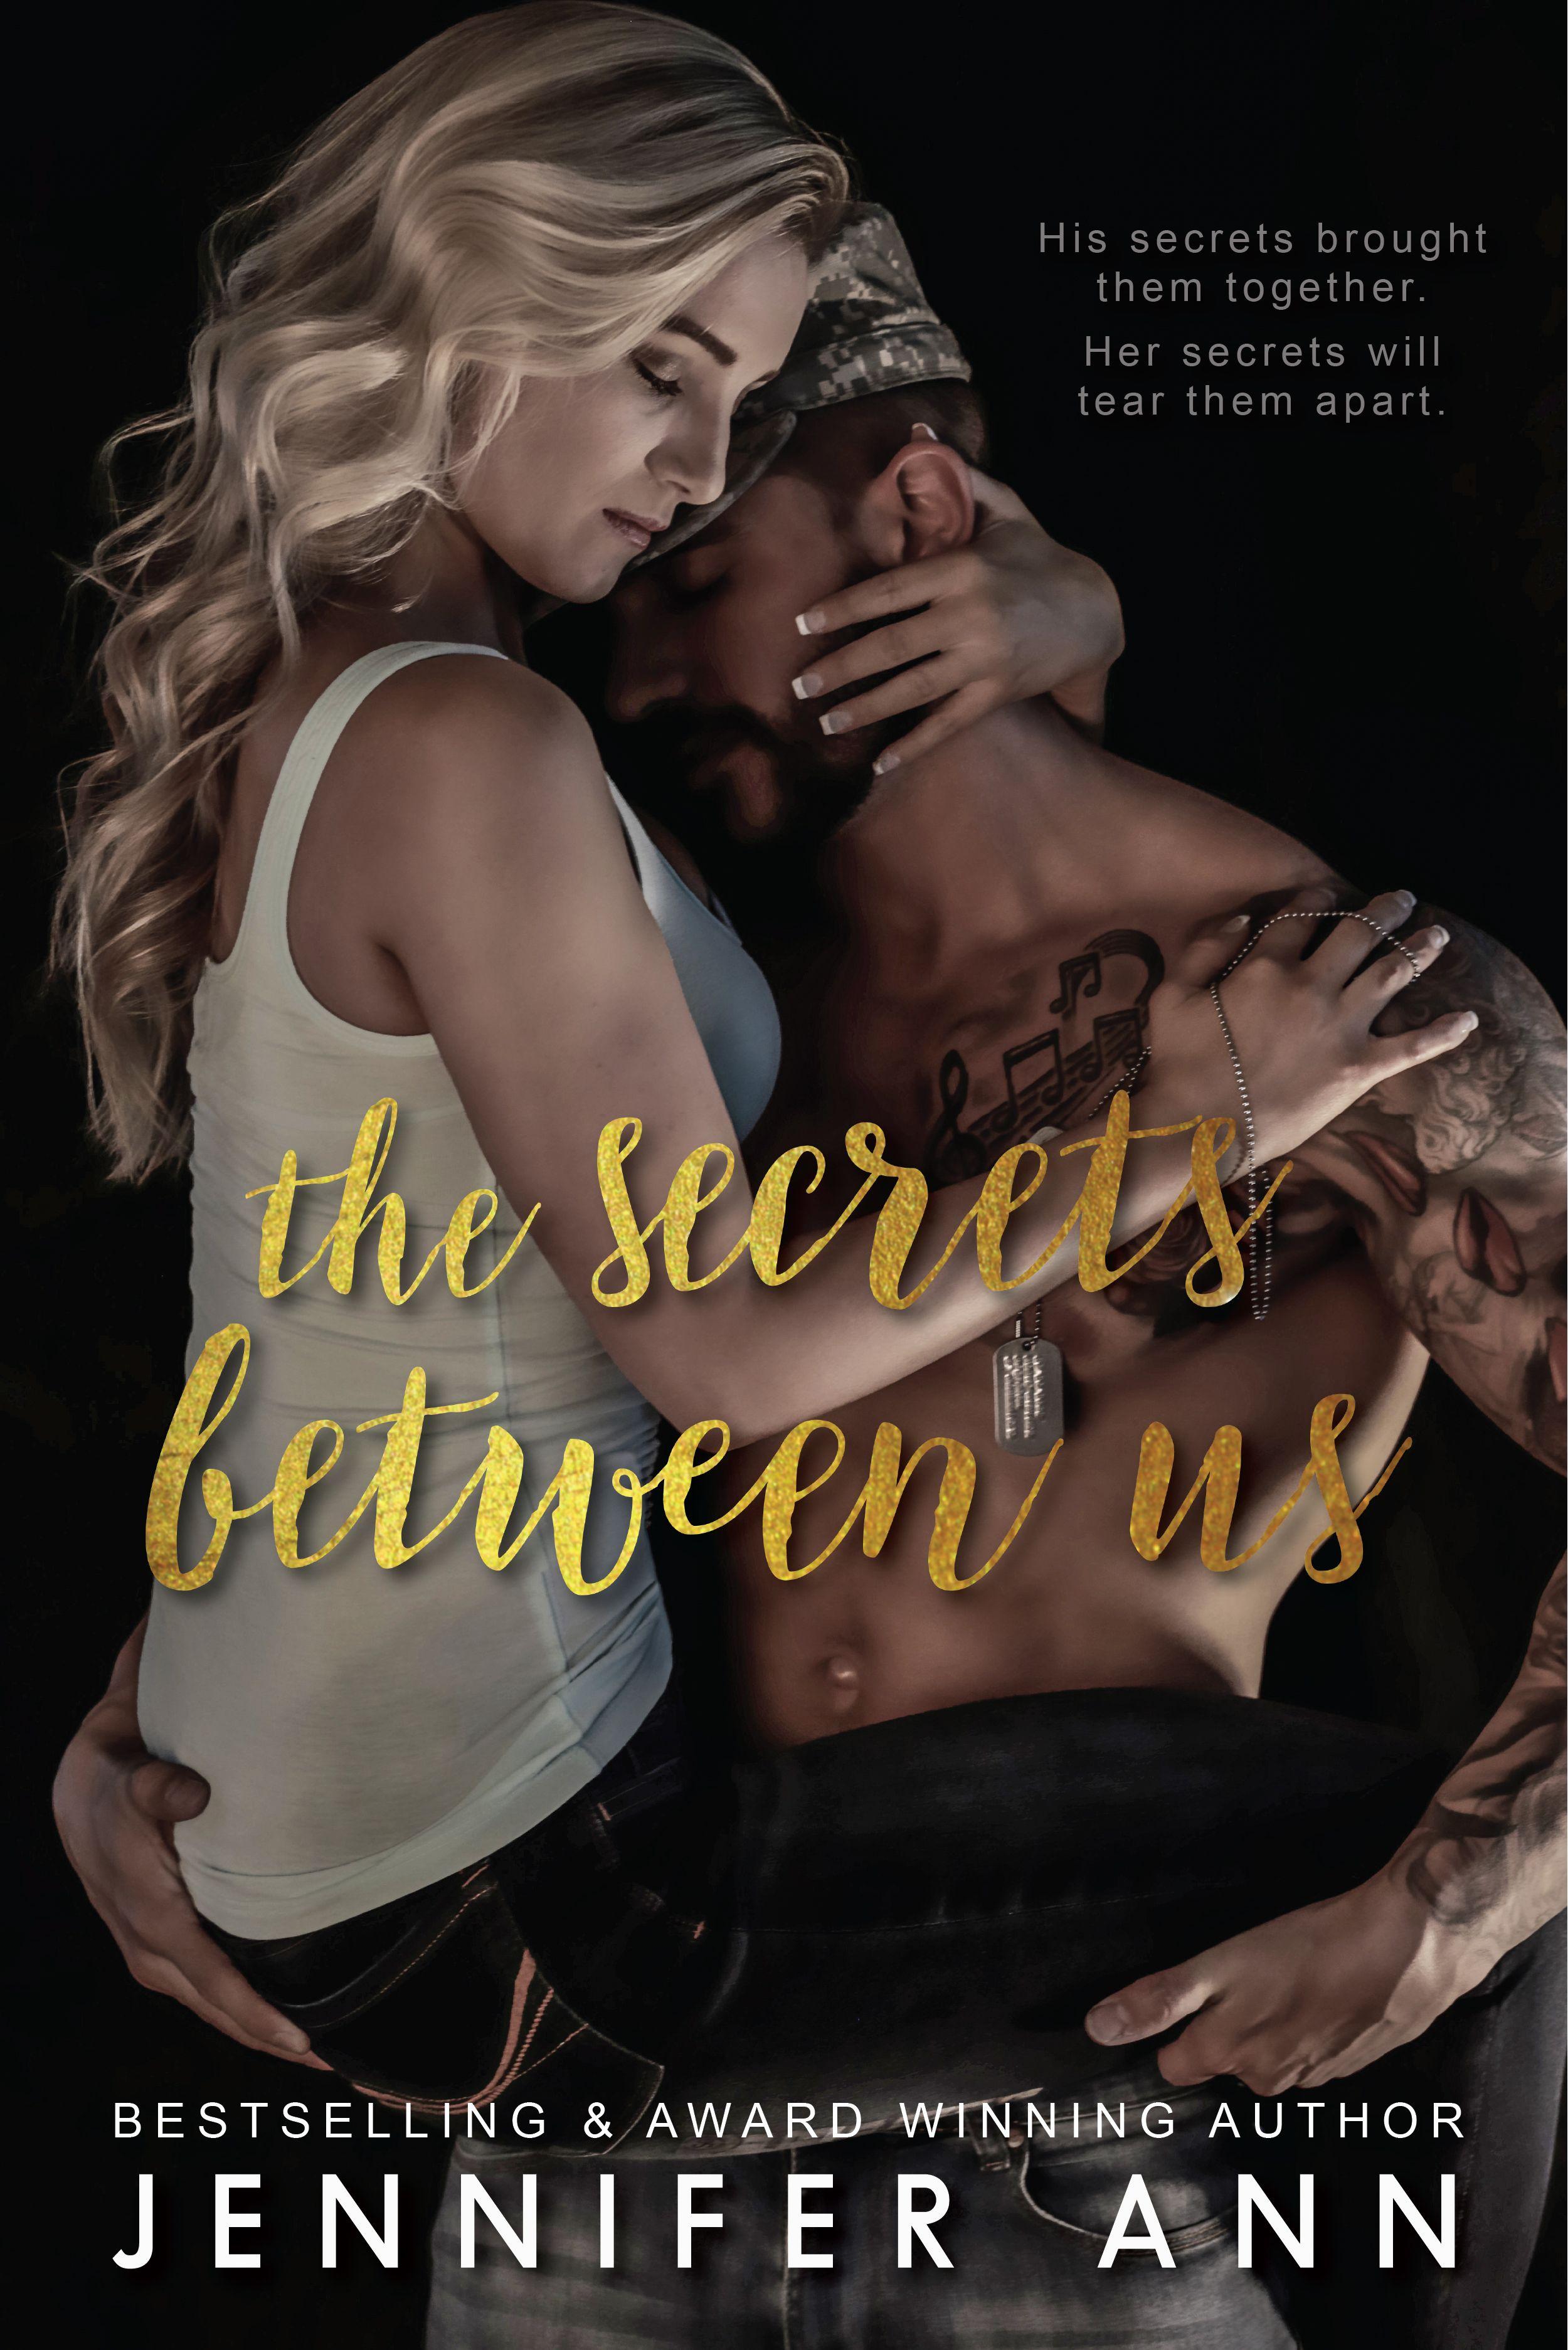 What is the secret of romance novels